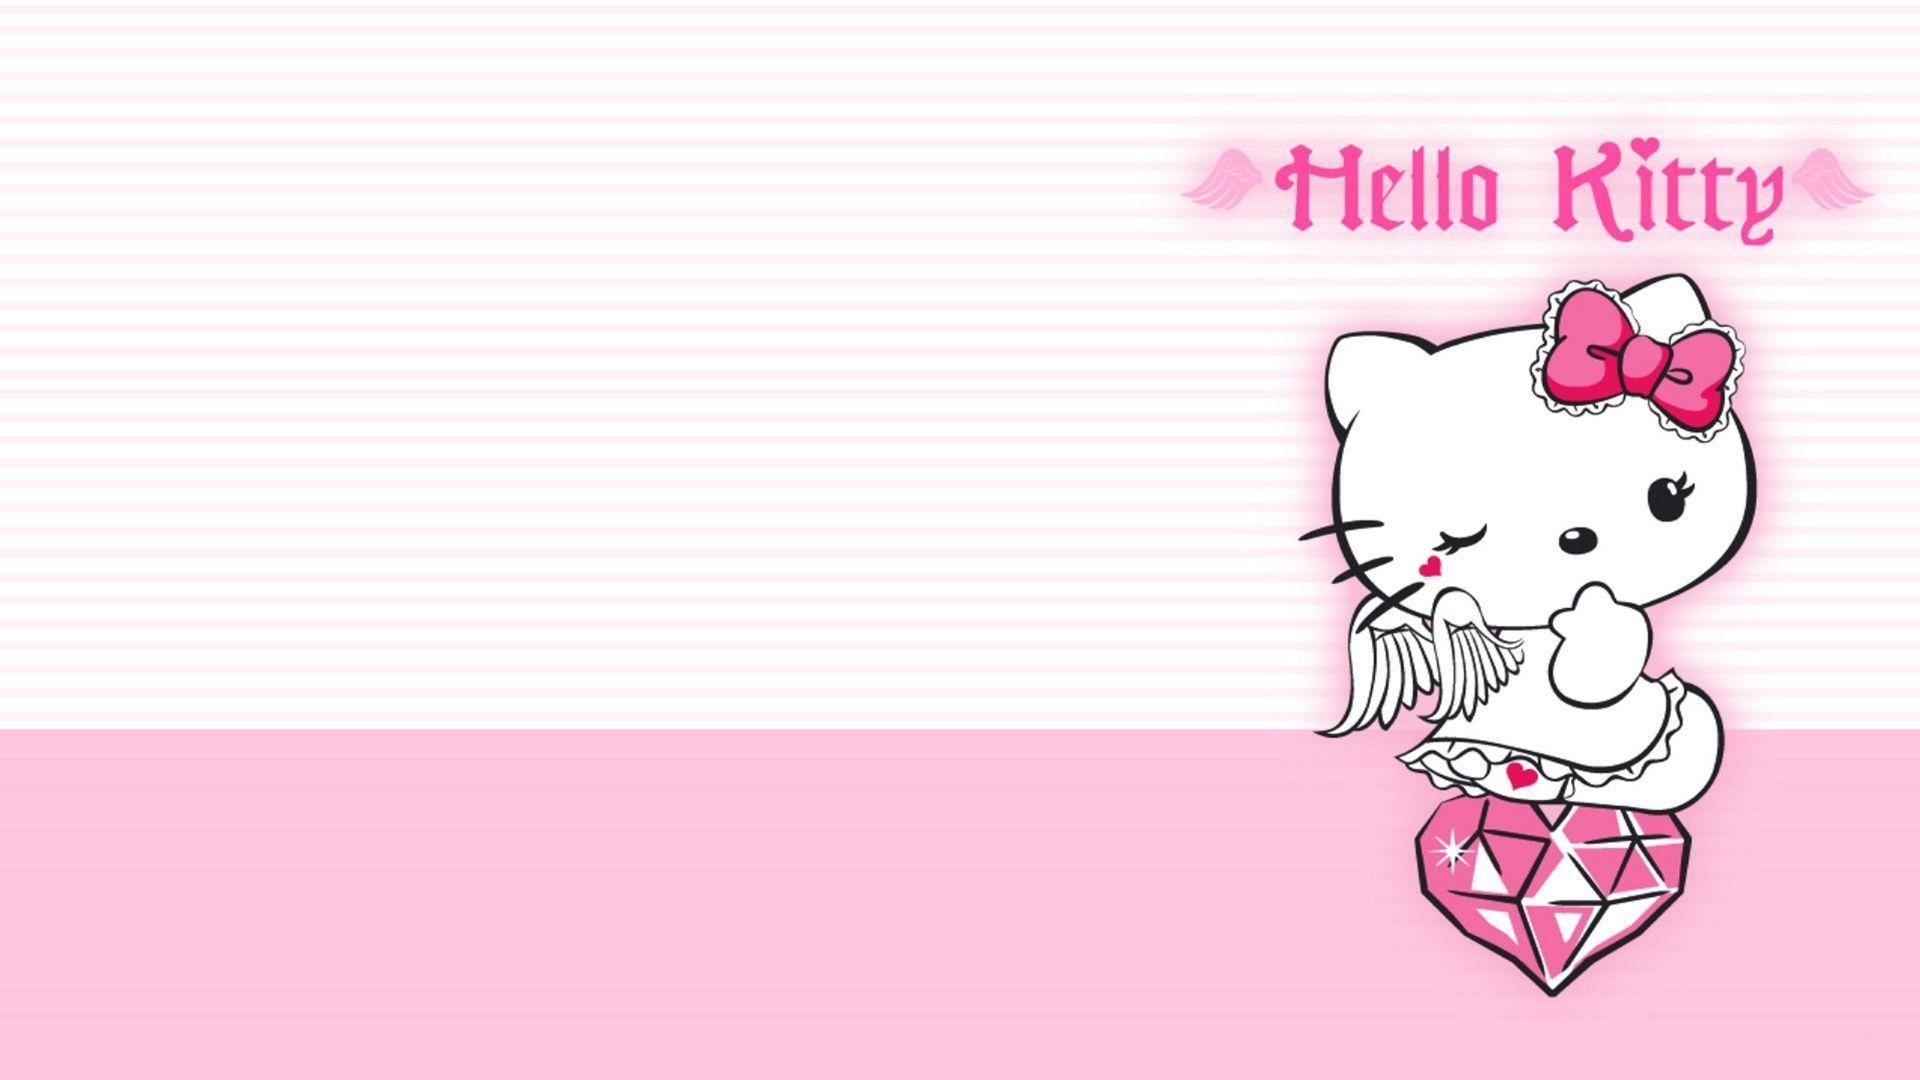 Popular Wallpaper Hello Kitty Cute - 1074238-hello-kitty-cute-image-background-1920x1080-notebook  Snapshot_74957.jpg